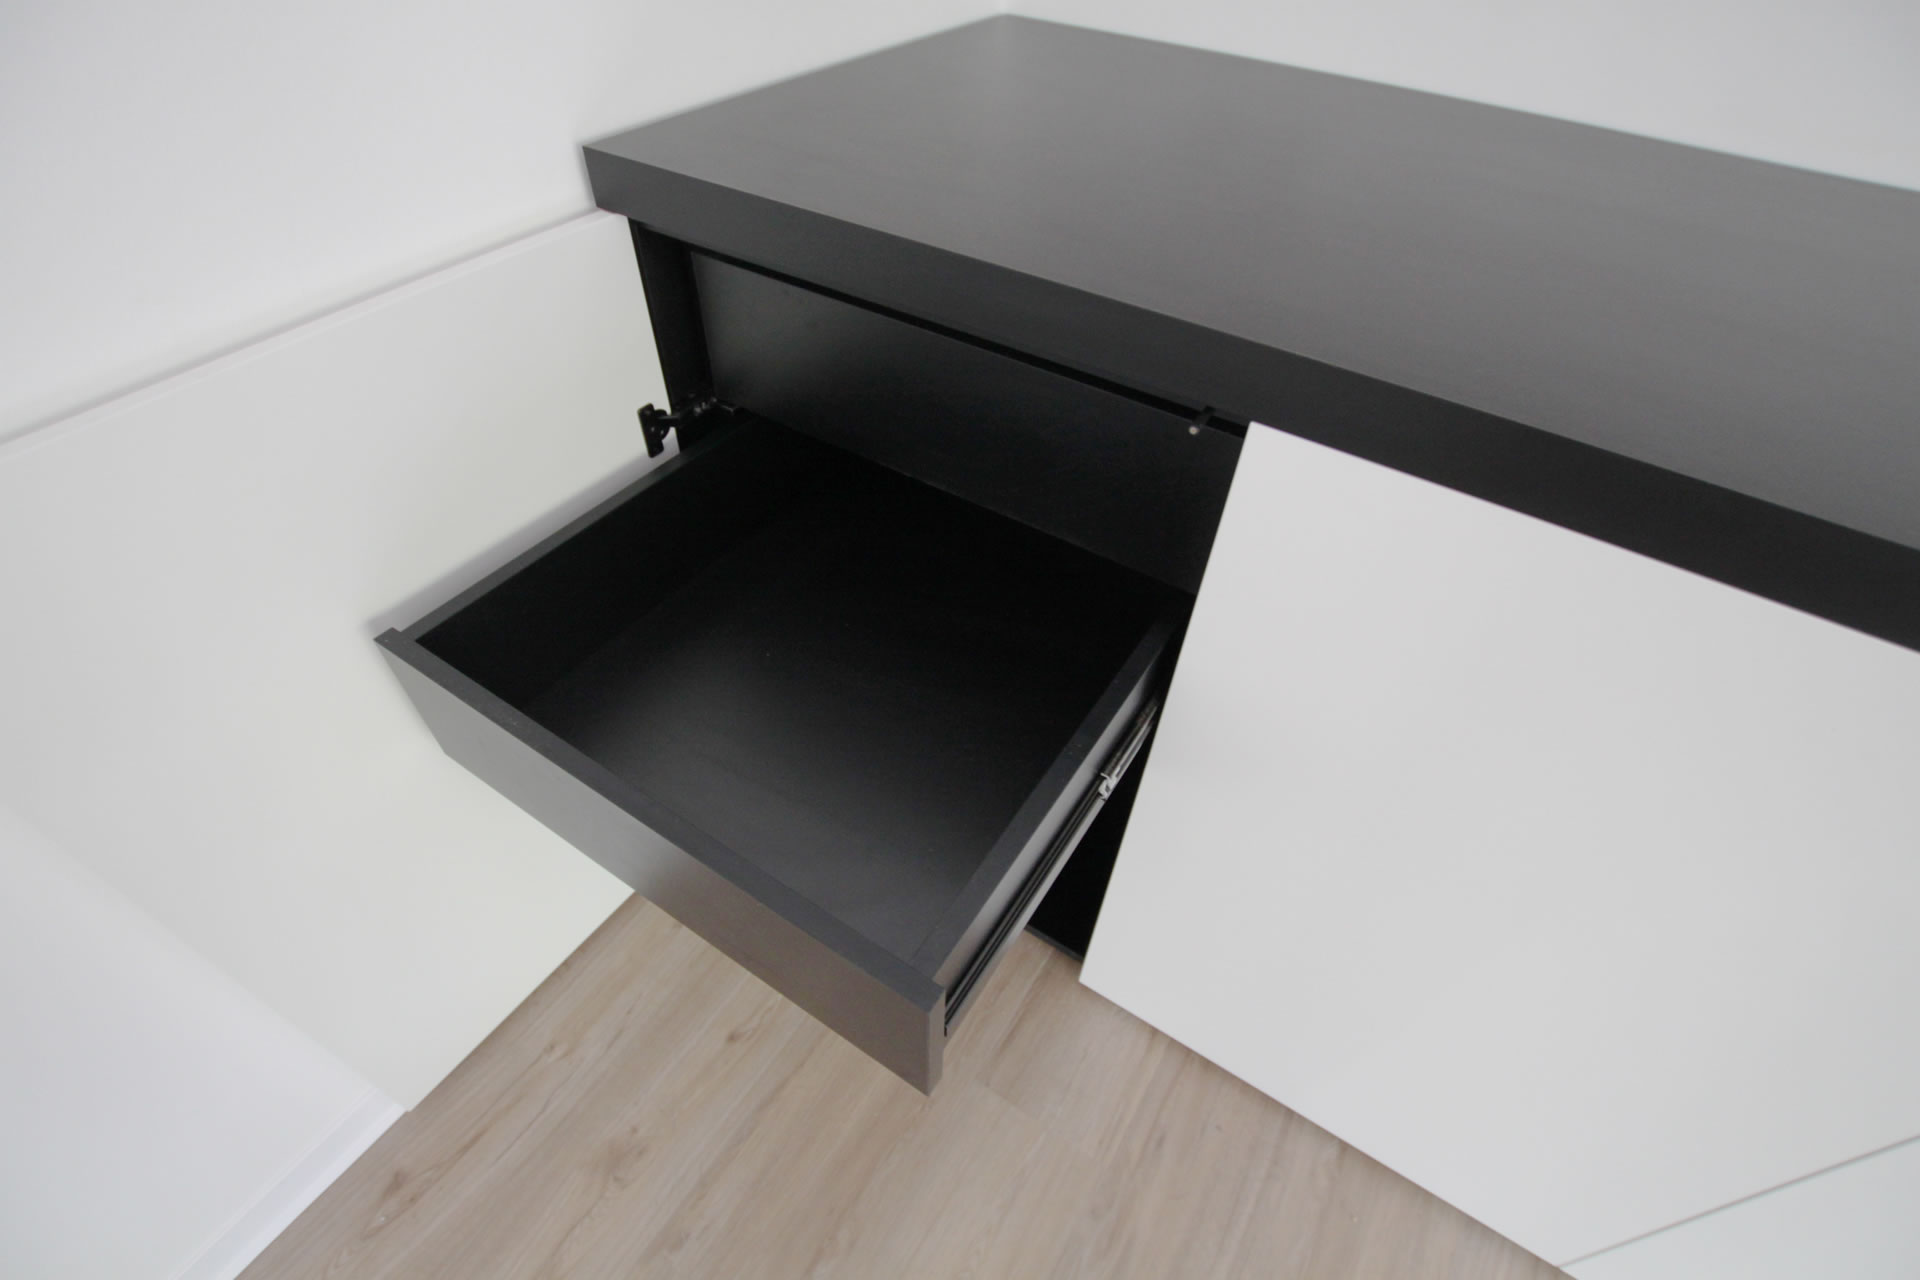 Küchengeschäft  Ladenbau ▭ Möblierung Goldschmiede Münster RECHTECK Design-Möbel